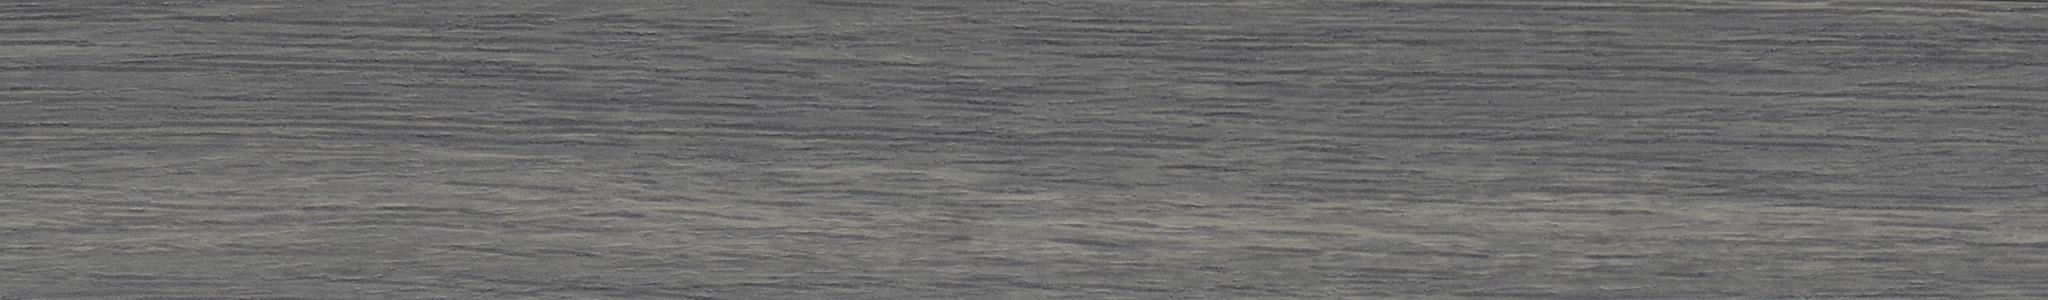 HD 244456 ABS Edge Painted Oak Midnight Pore